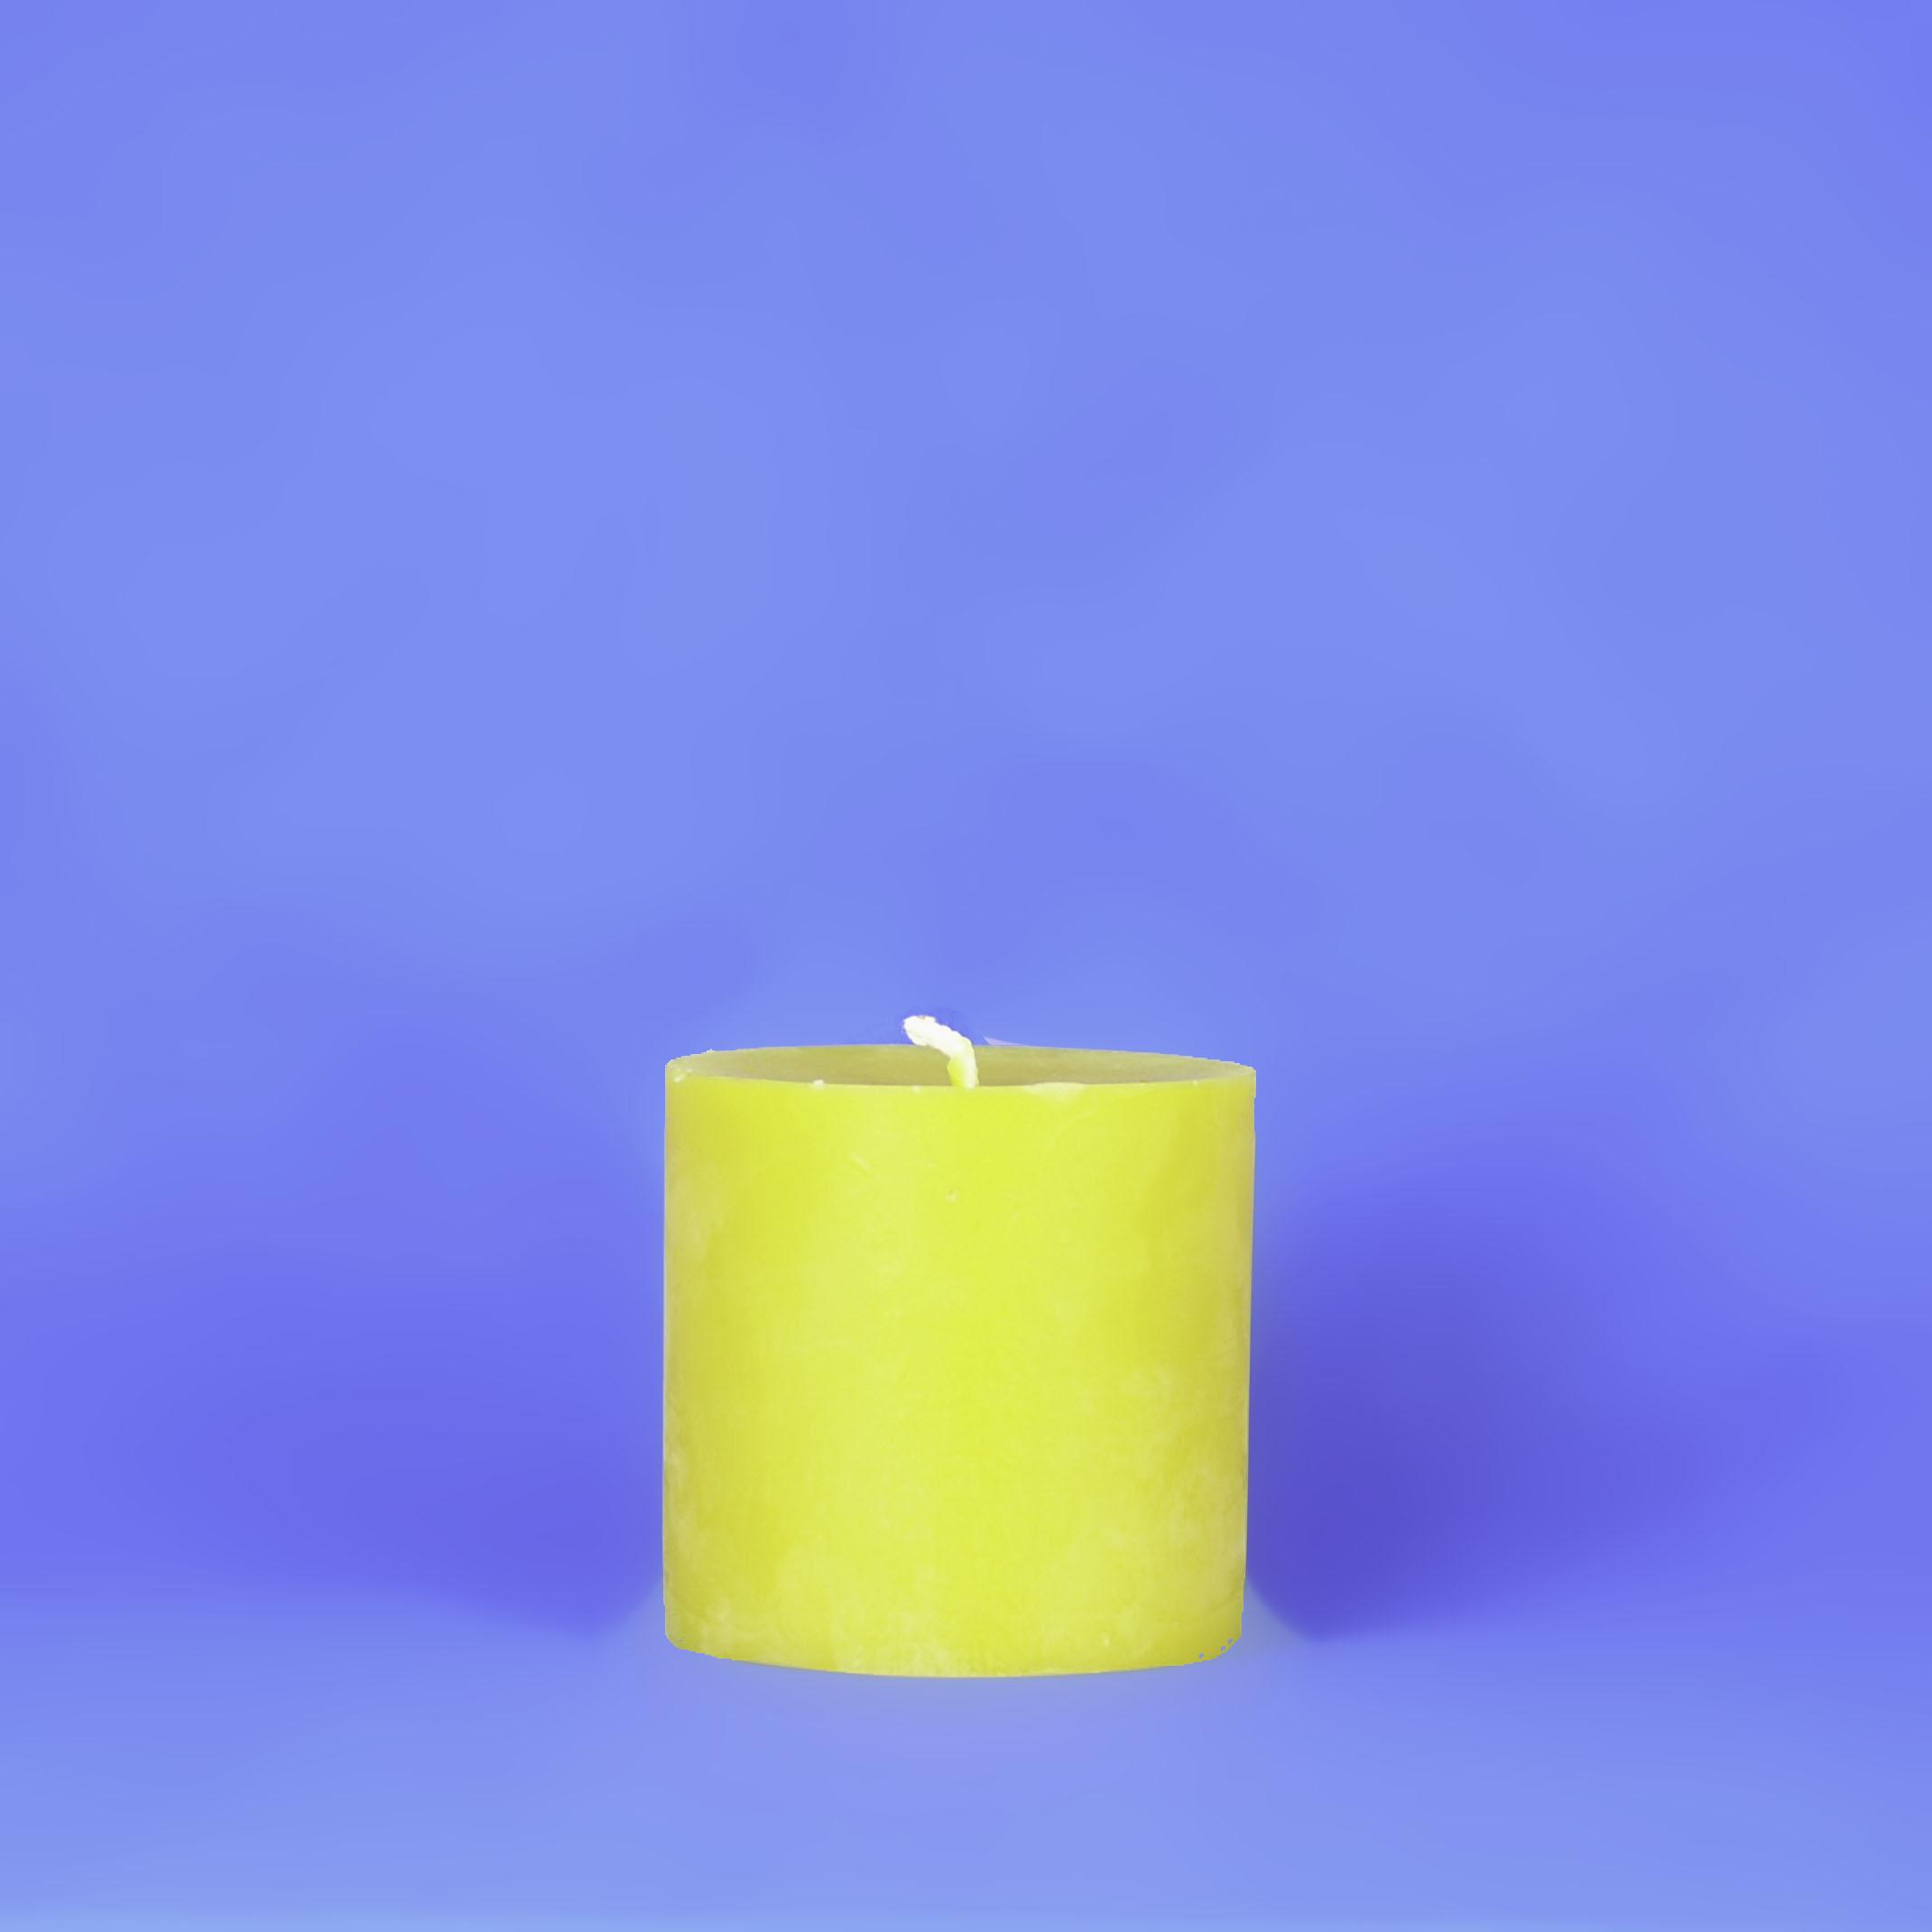 "Beeswax 4"" x 4"" Smooth Pillar Candle"